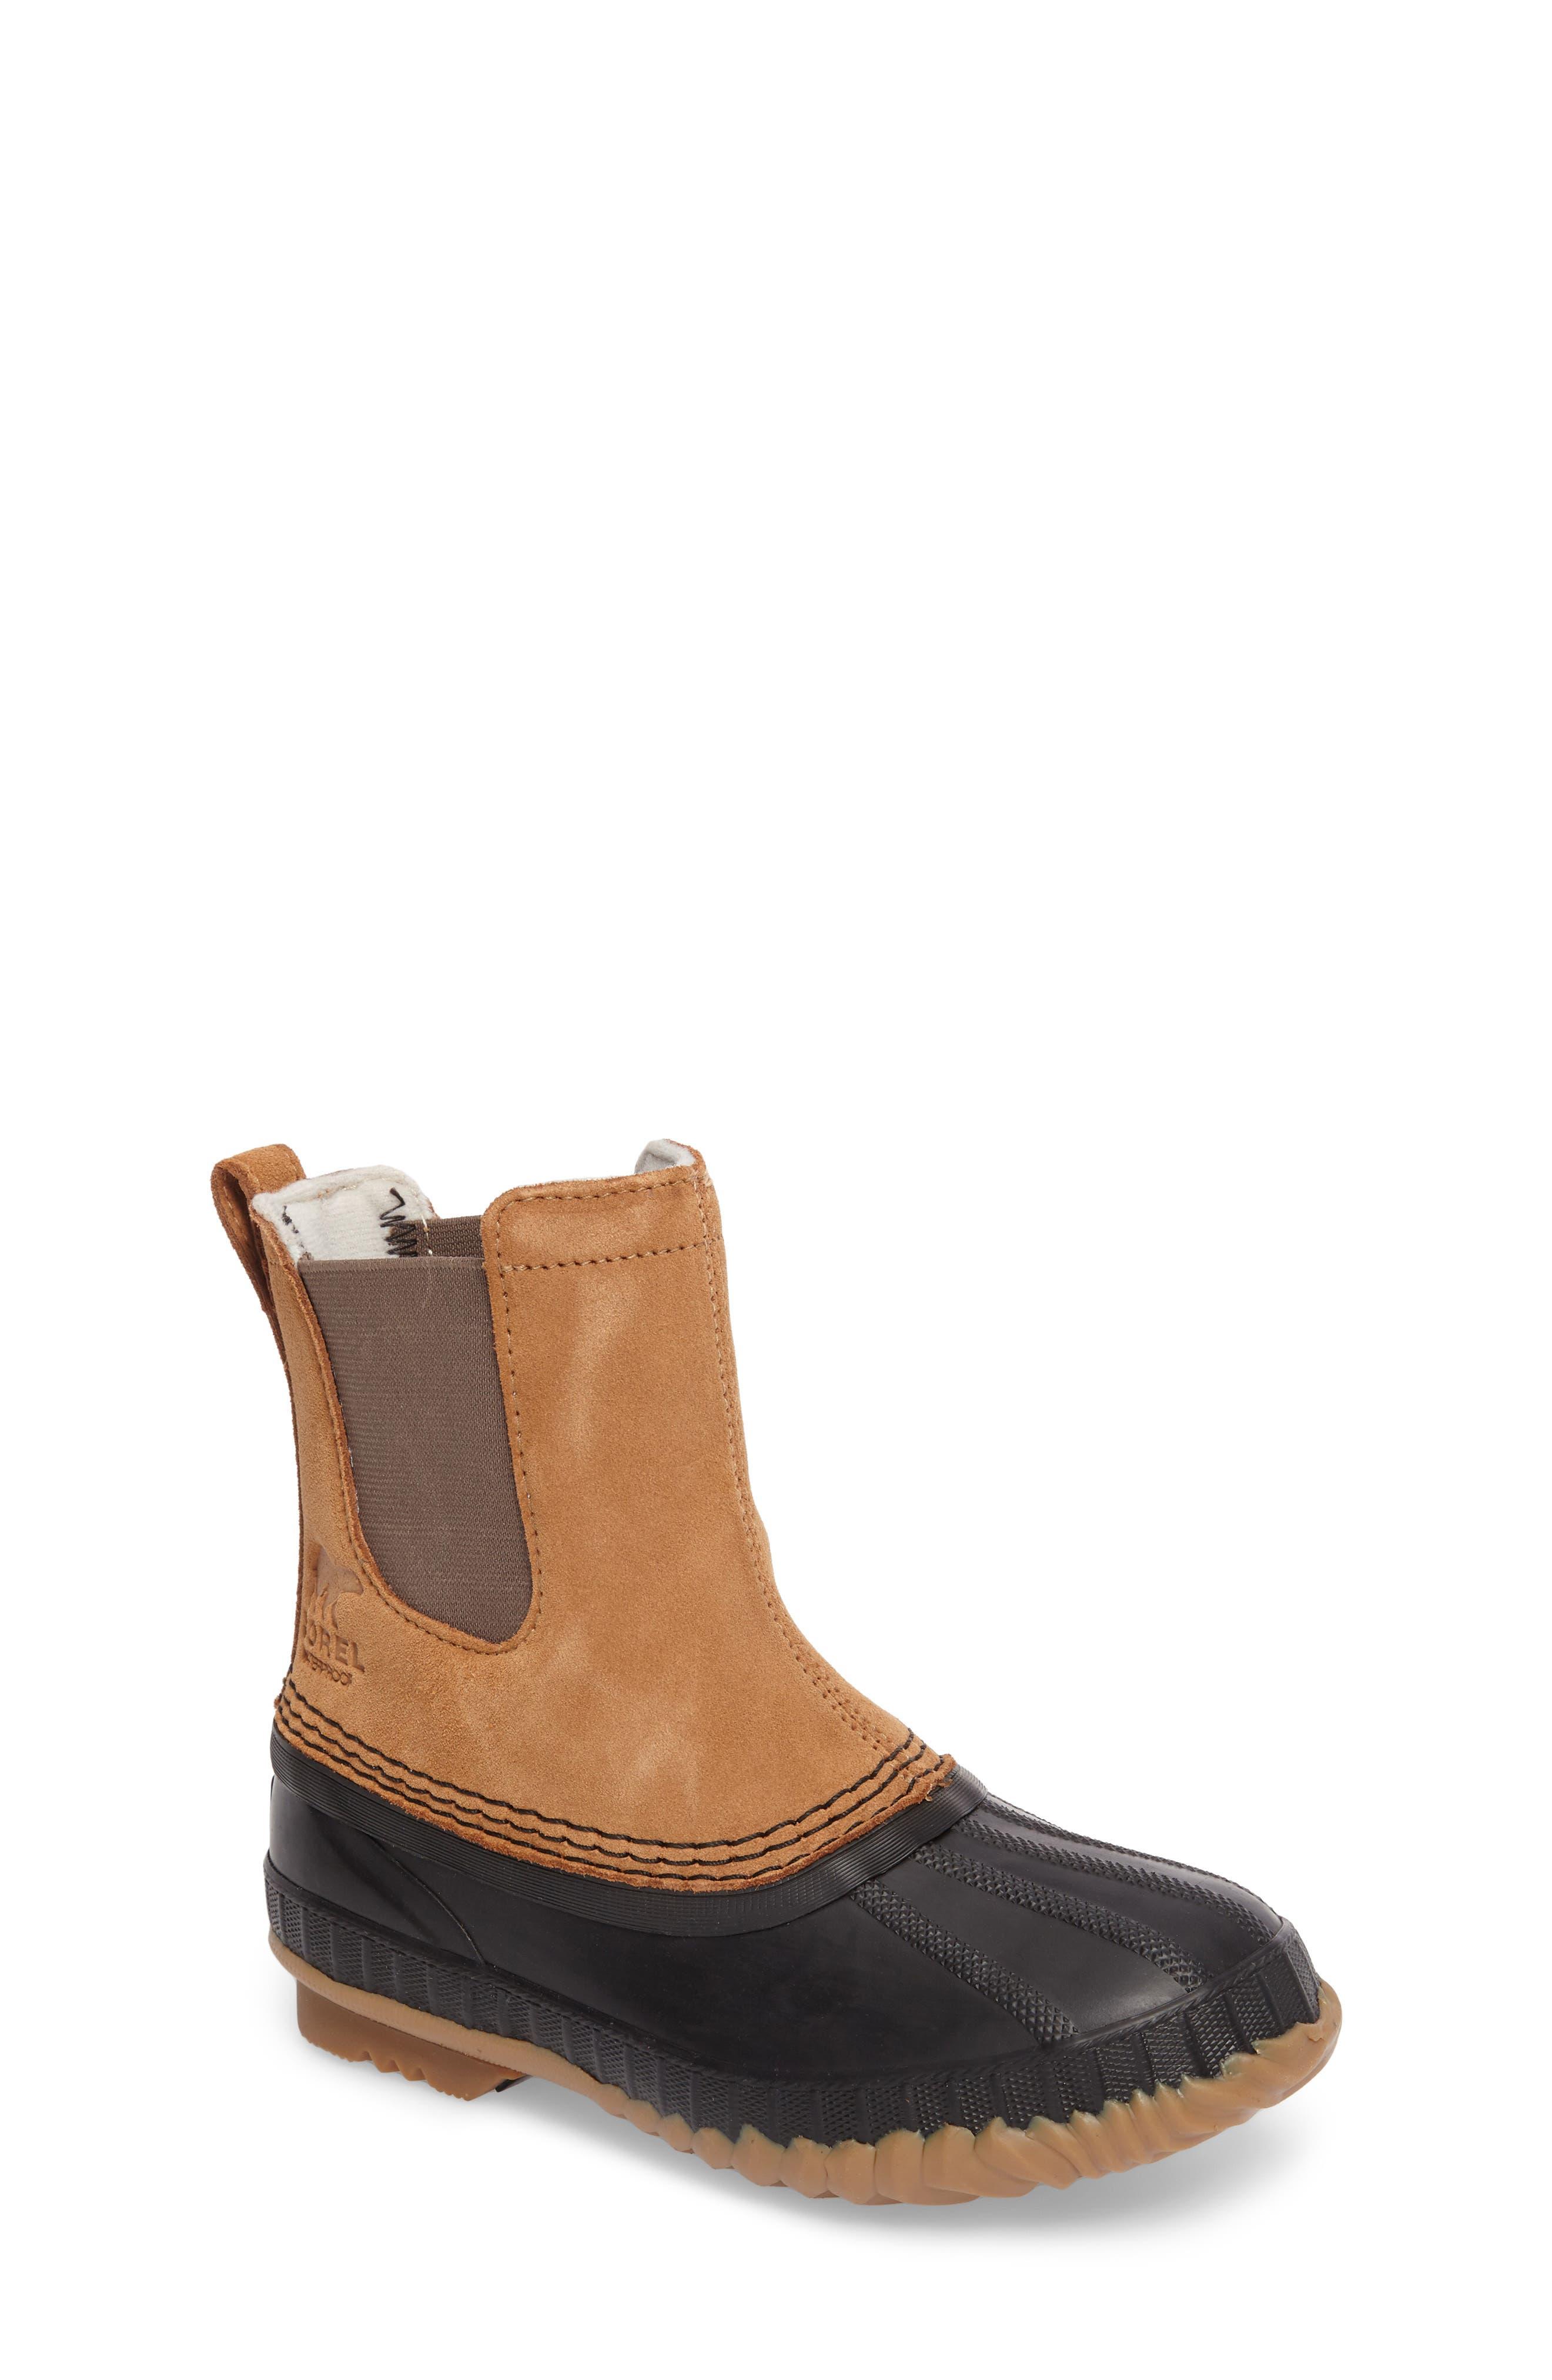 SOREL Cheyanne II Waterproof Insulated Chelsea Boot (Little Kid & Big Kid)